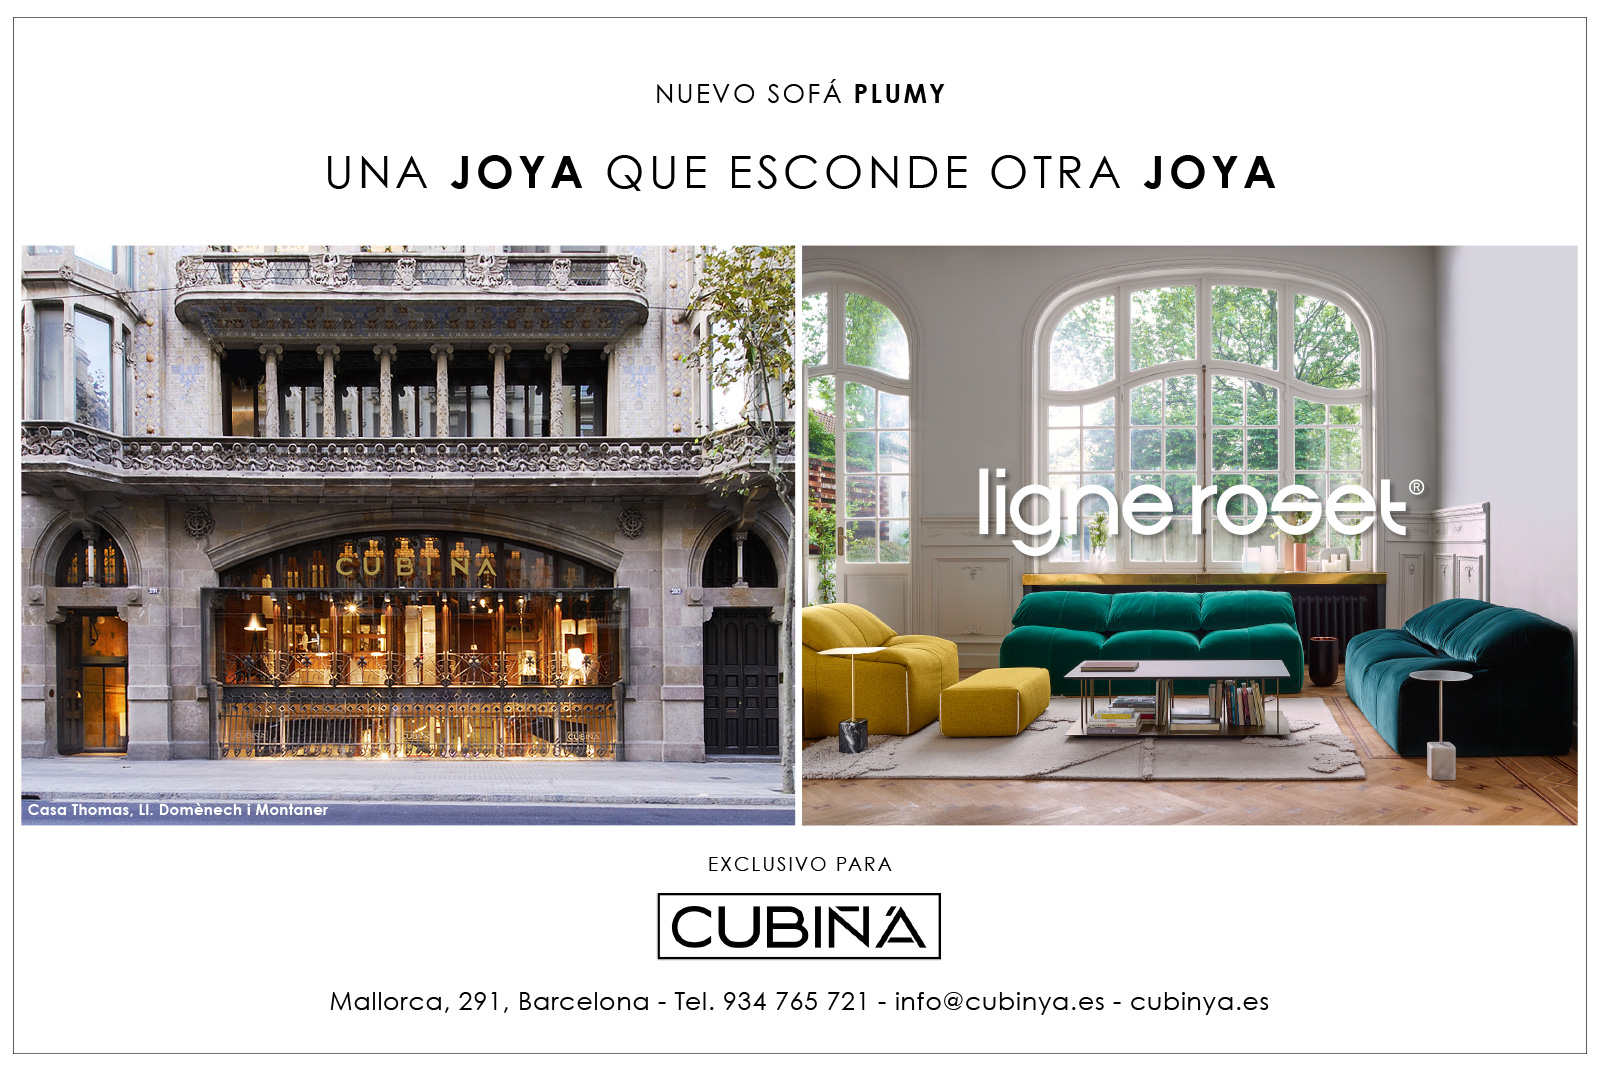 Arquitectura interiorismo y construcci n la vanguardia - Cubina barcelona ...